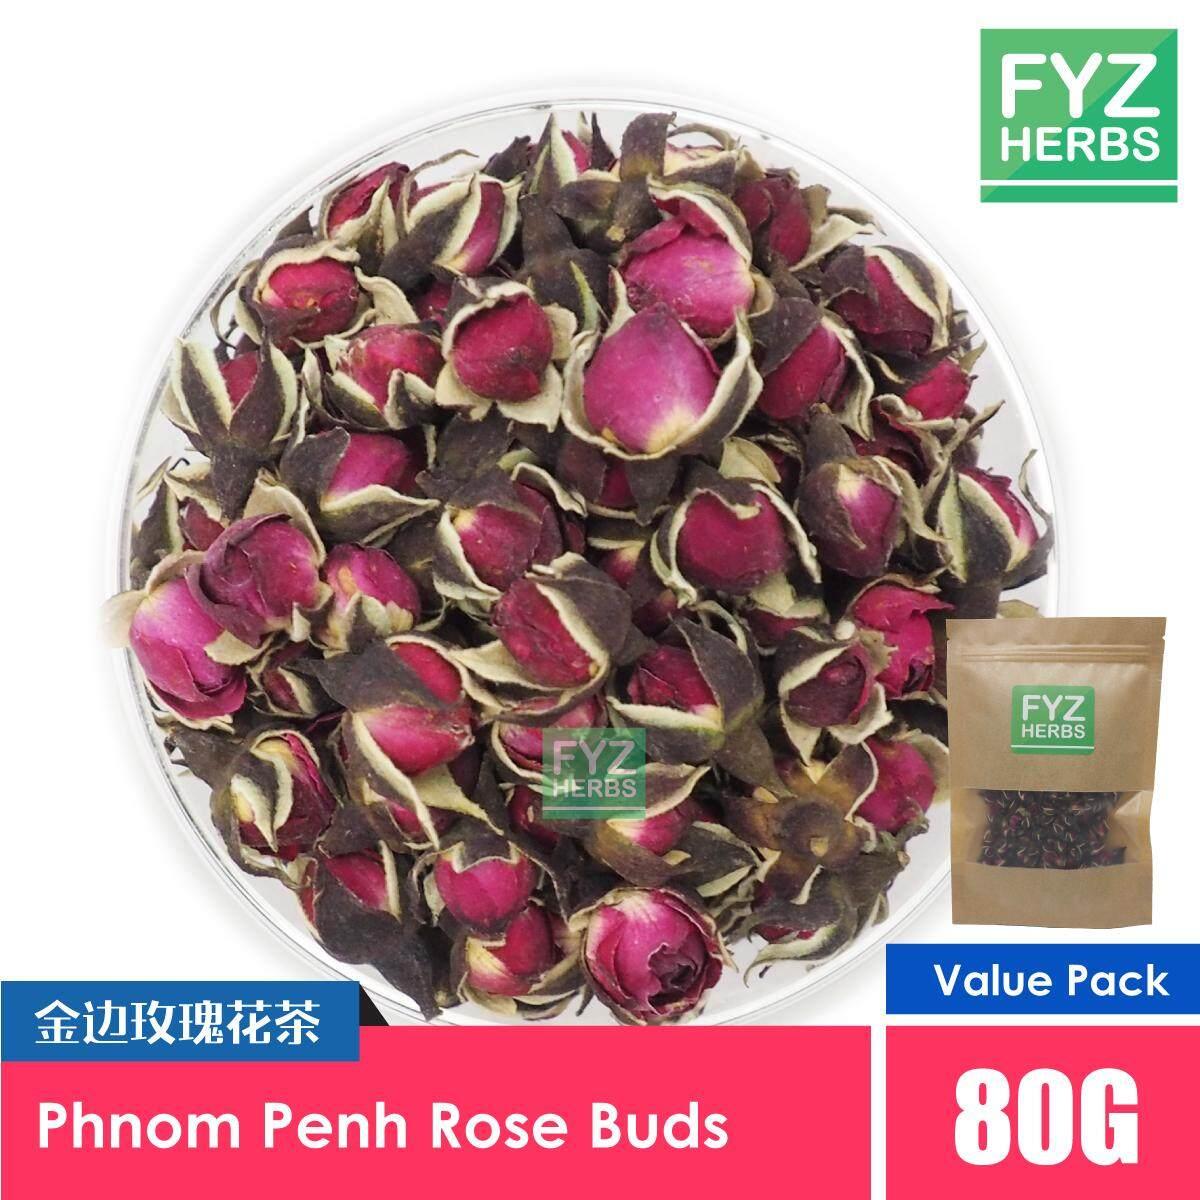 FYZ Herbs Phnom Penh Rose Buds Flower Tea 80G [Value Pack] 金边玫瑰花茶袋装 80G